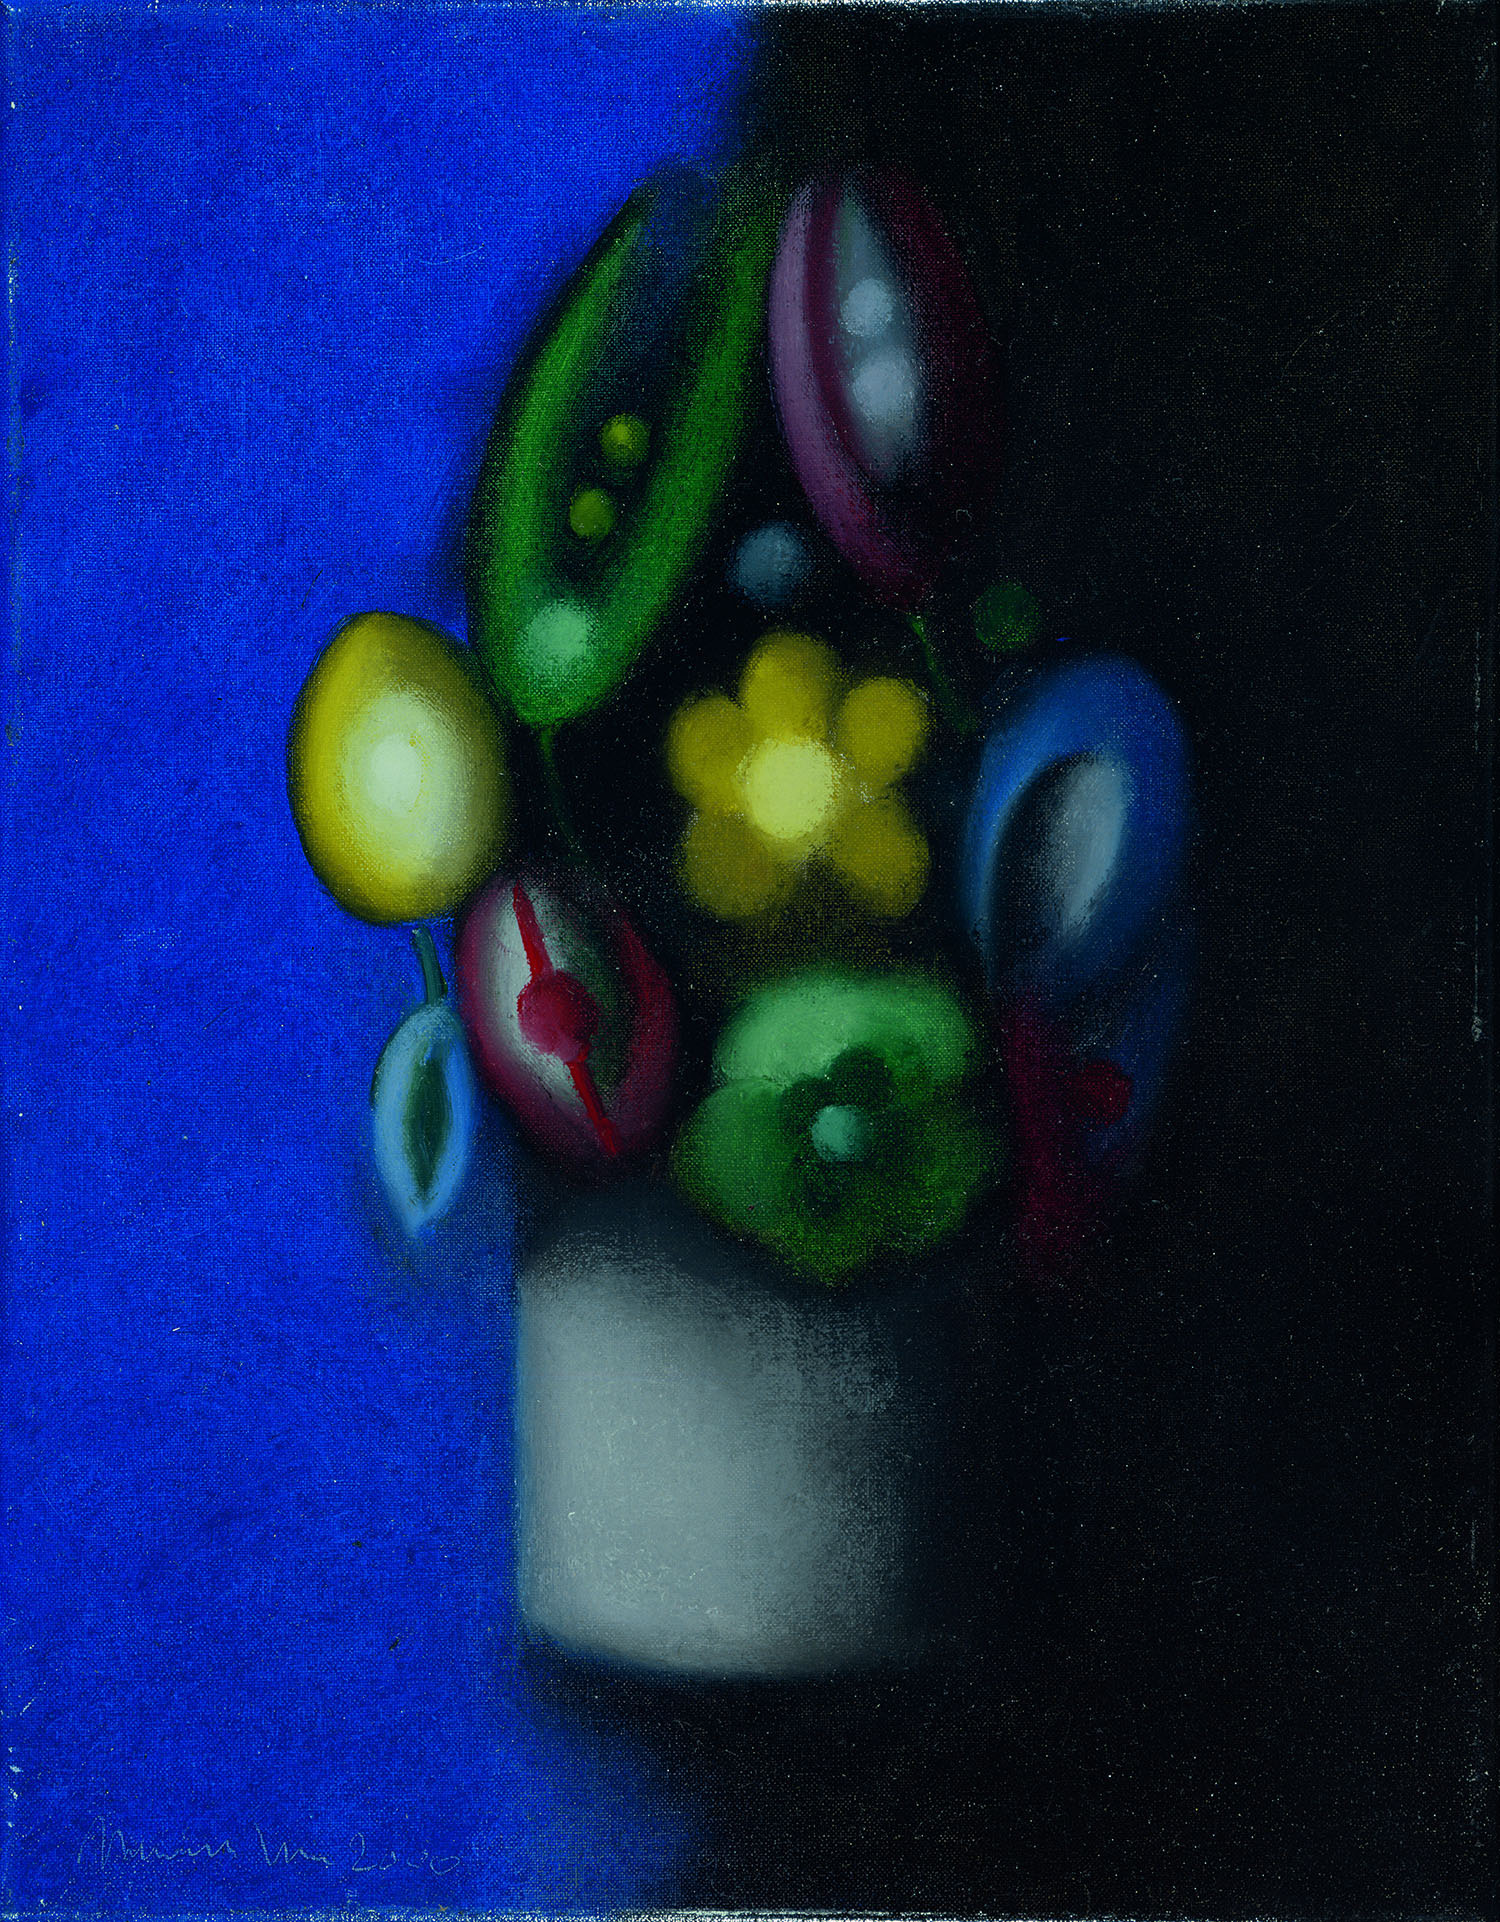 Flors mexicanes, 2000, oli sobre tela, cm 46 x 33